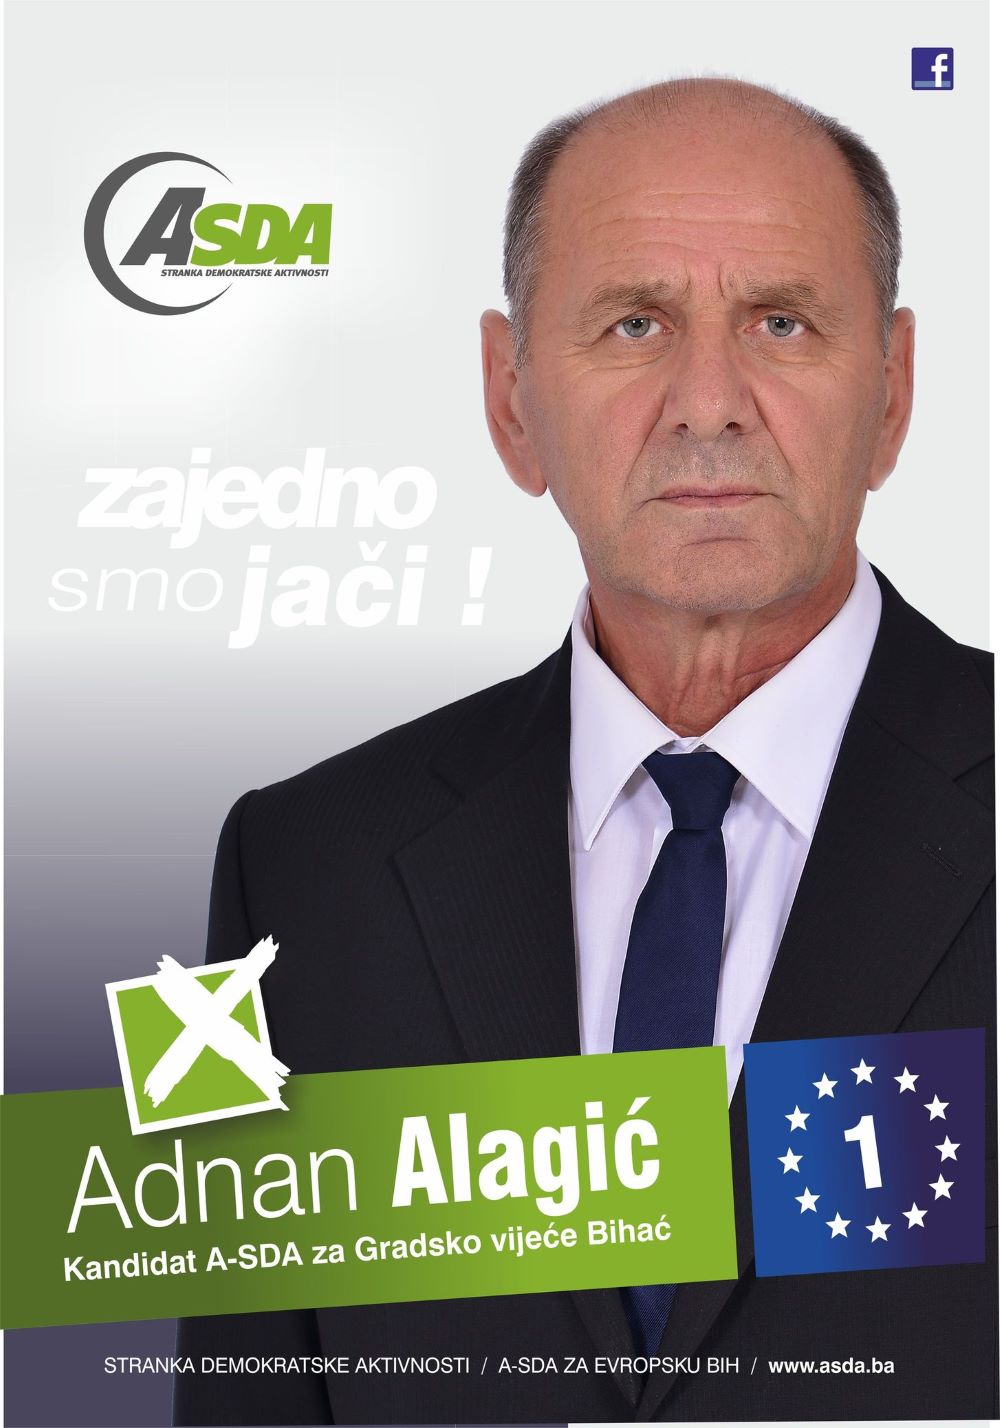 Adnan Alagić